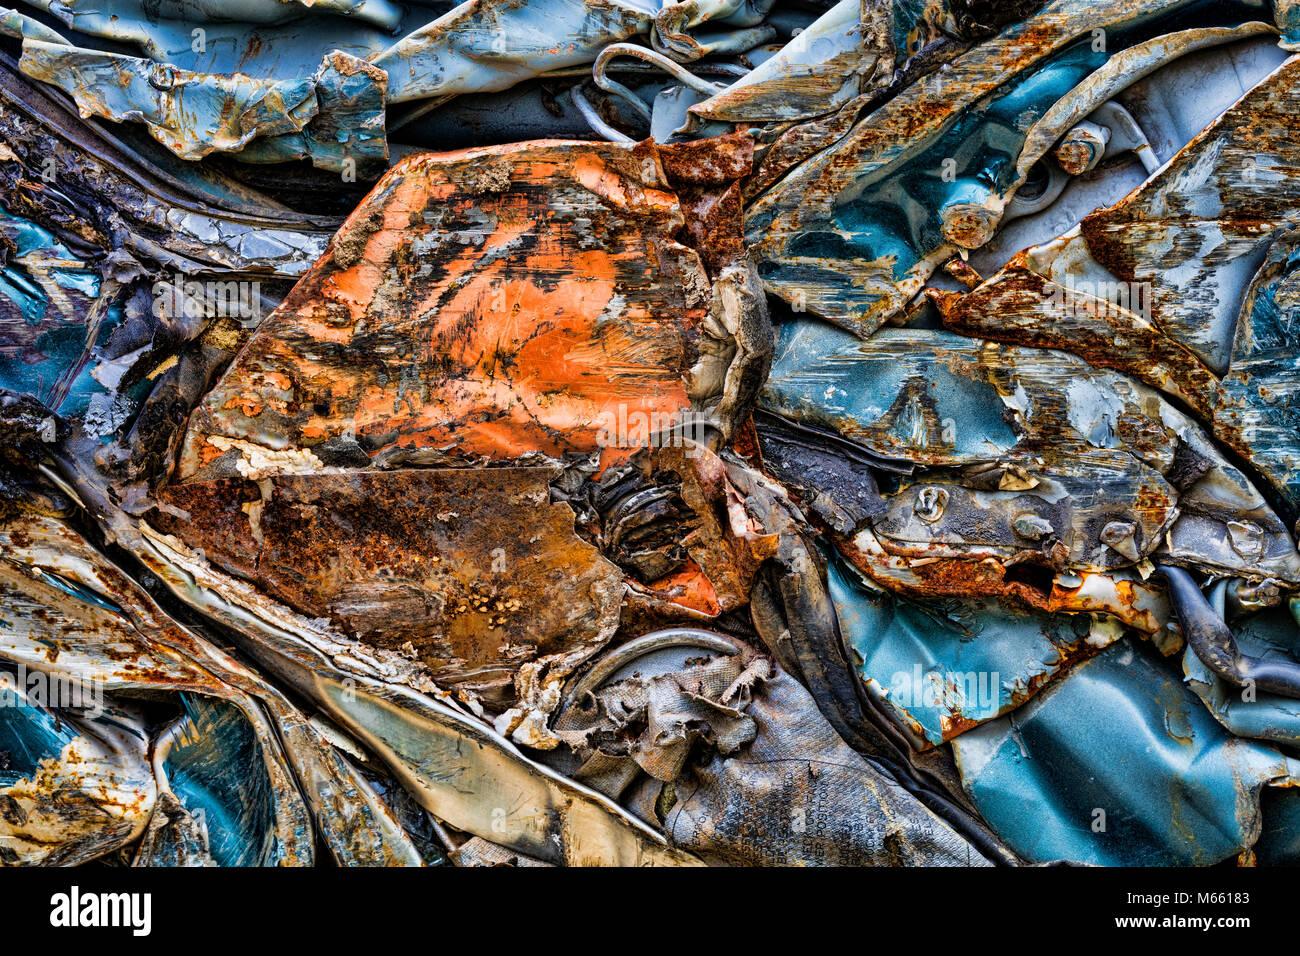 Scrap metal prepared for Recycle, Alaska, Chena Hot Springs. Photographed at 50.6 megapixels - Stock Image